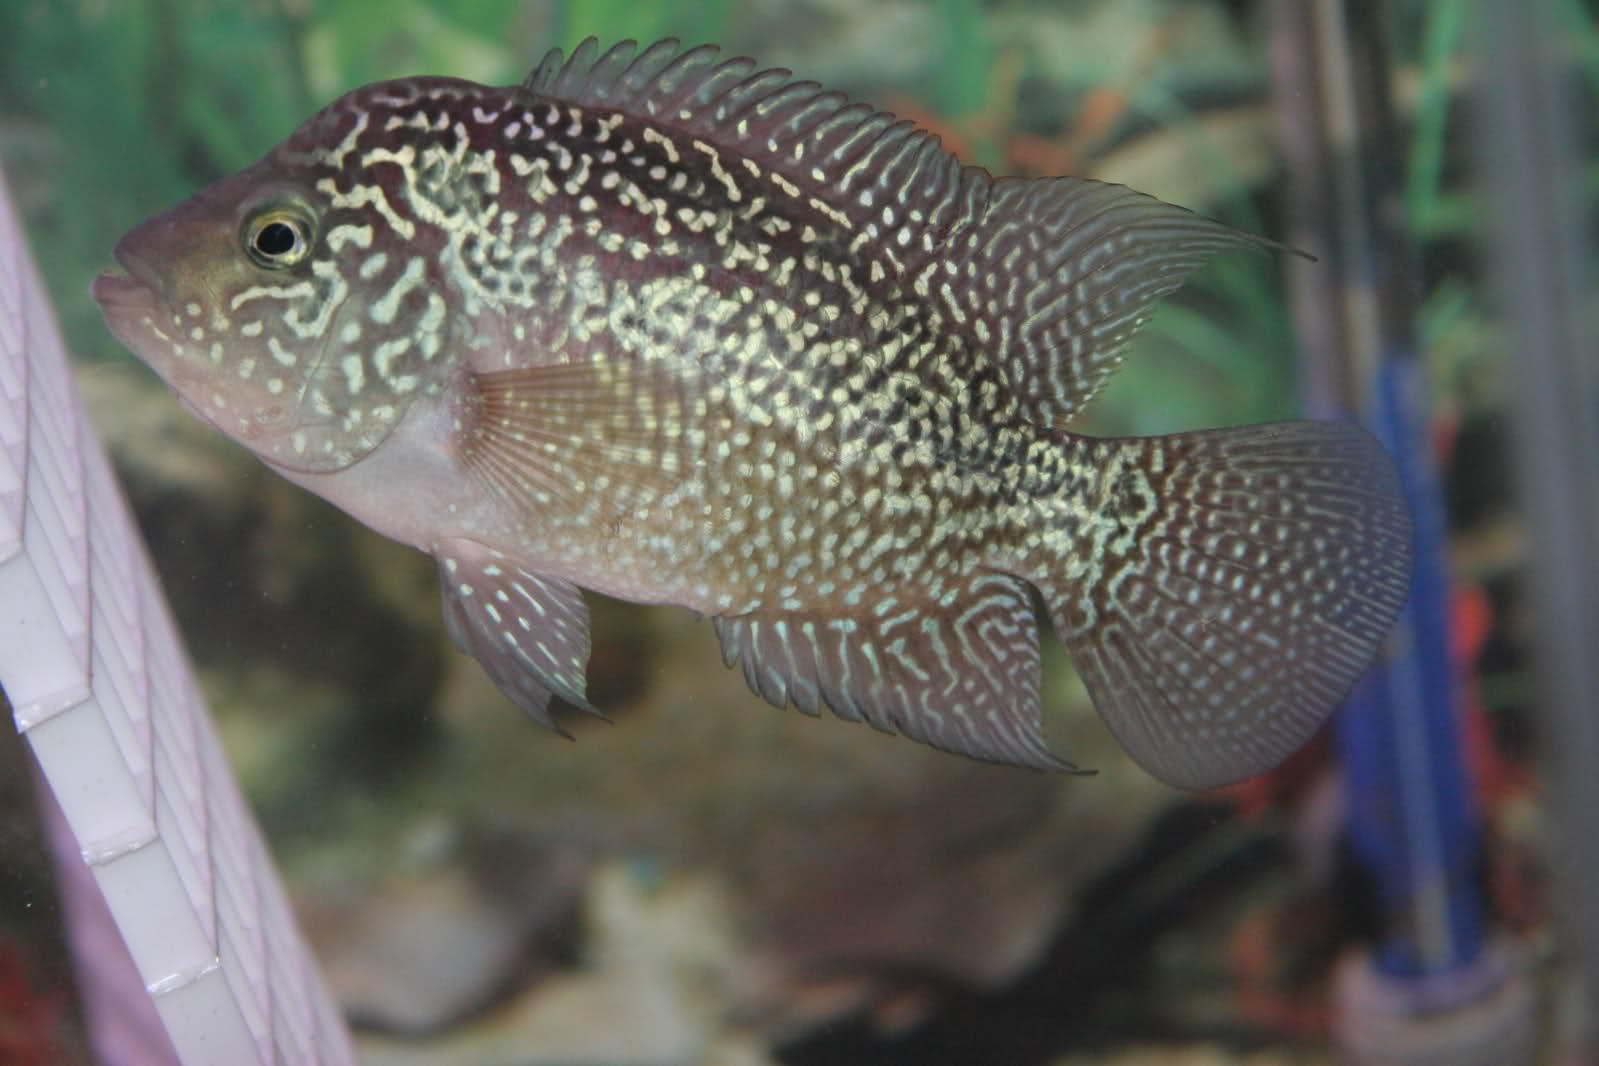 Marine aquariums dimond koi fish for Small koi fish for sale